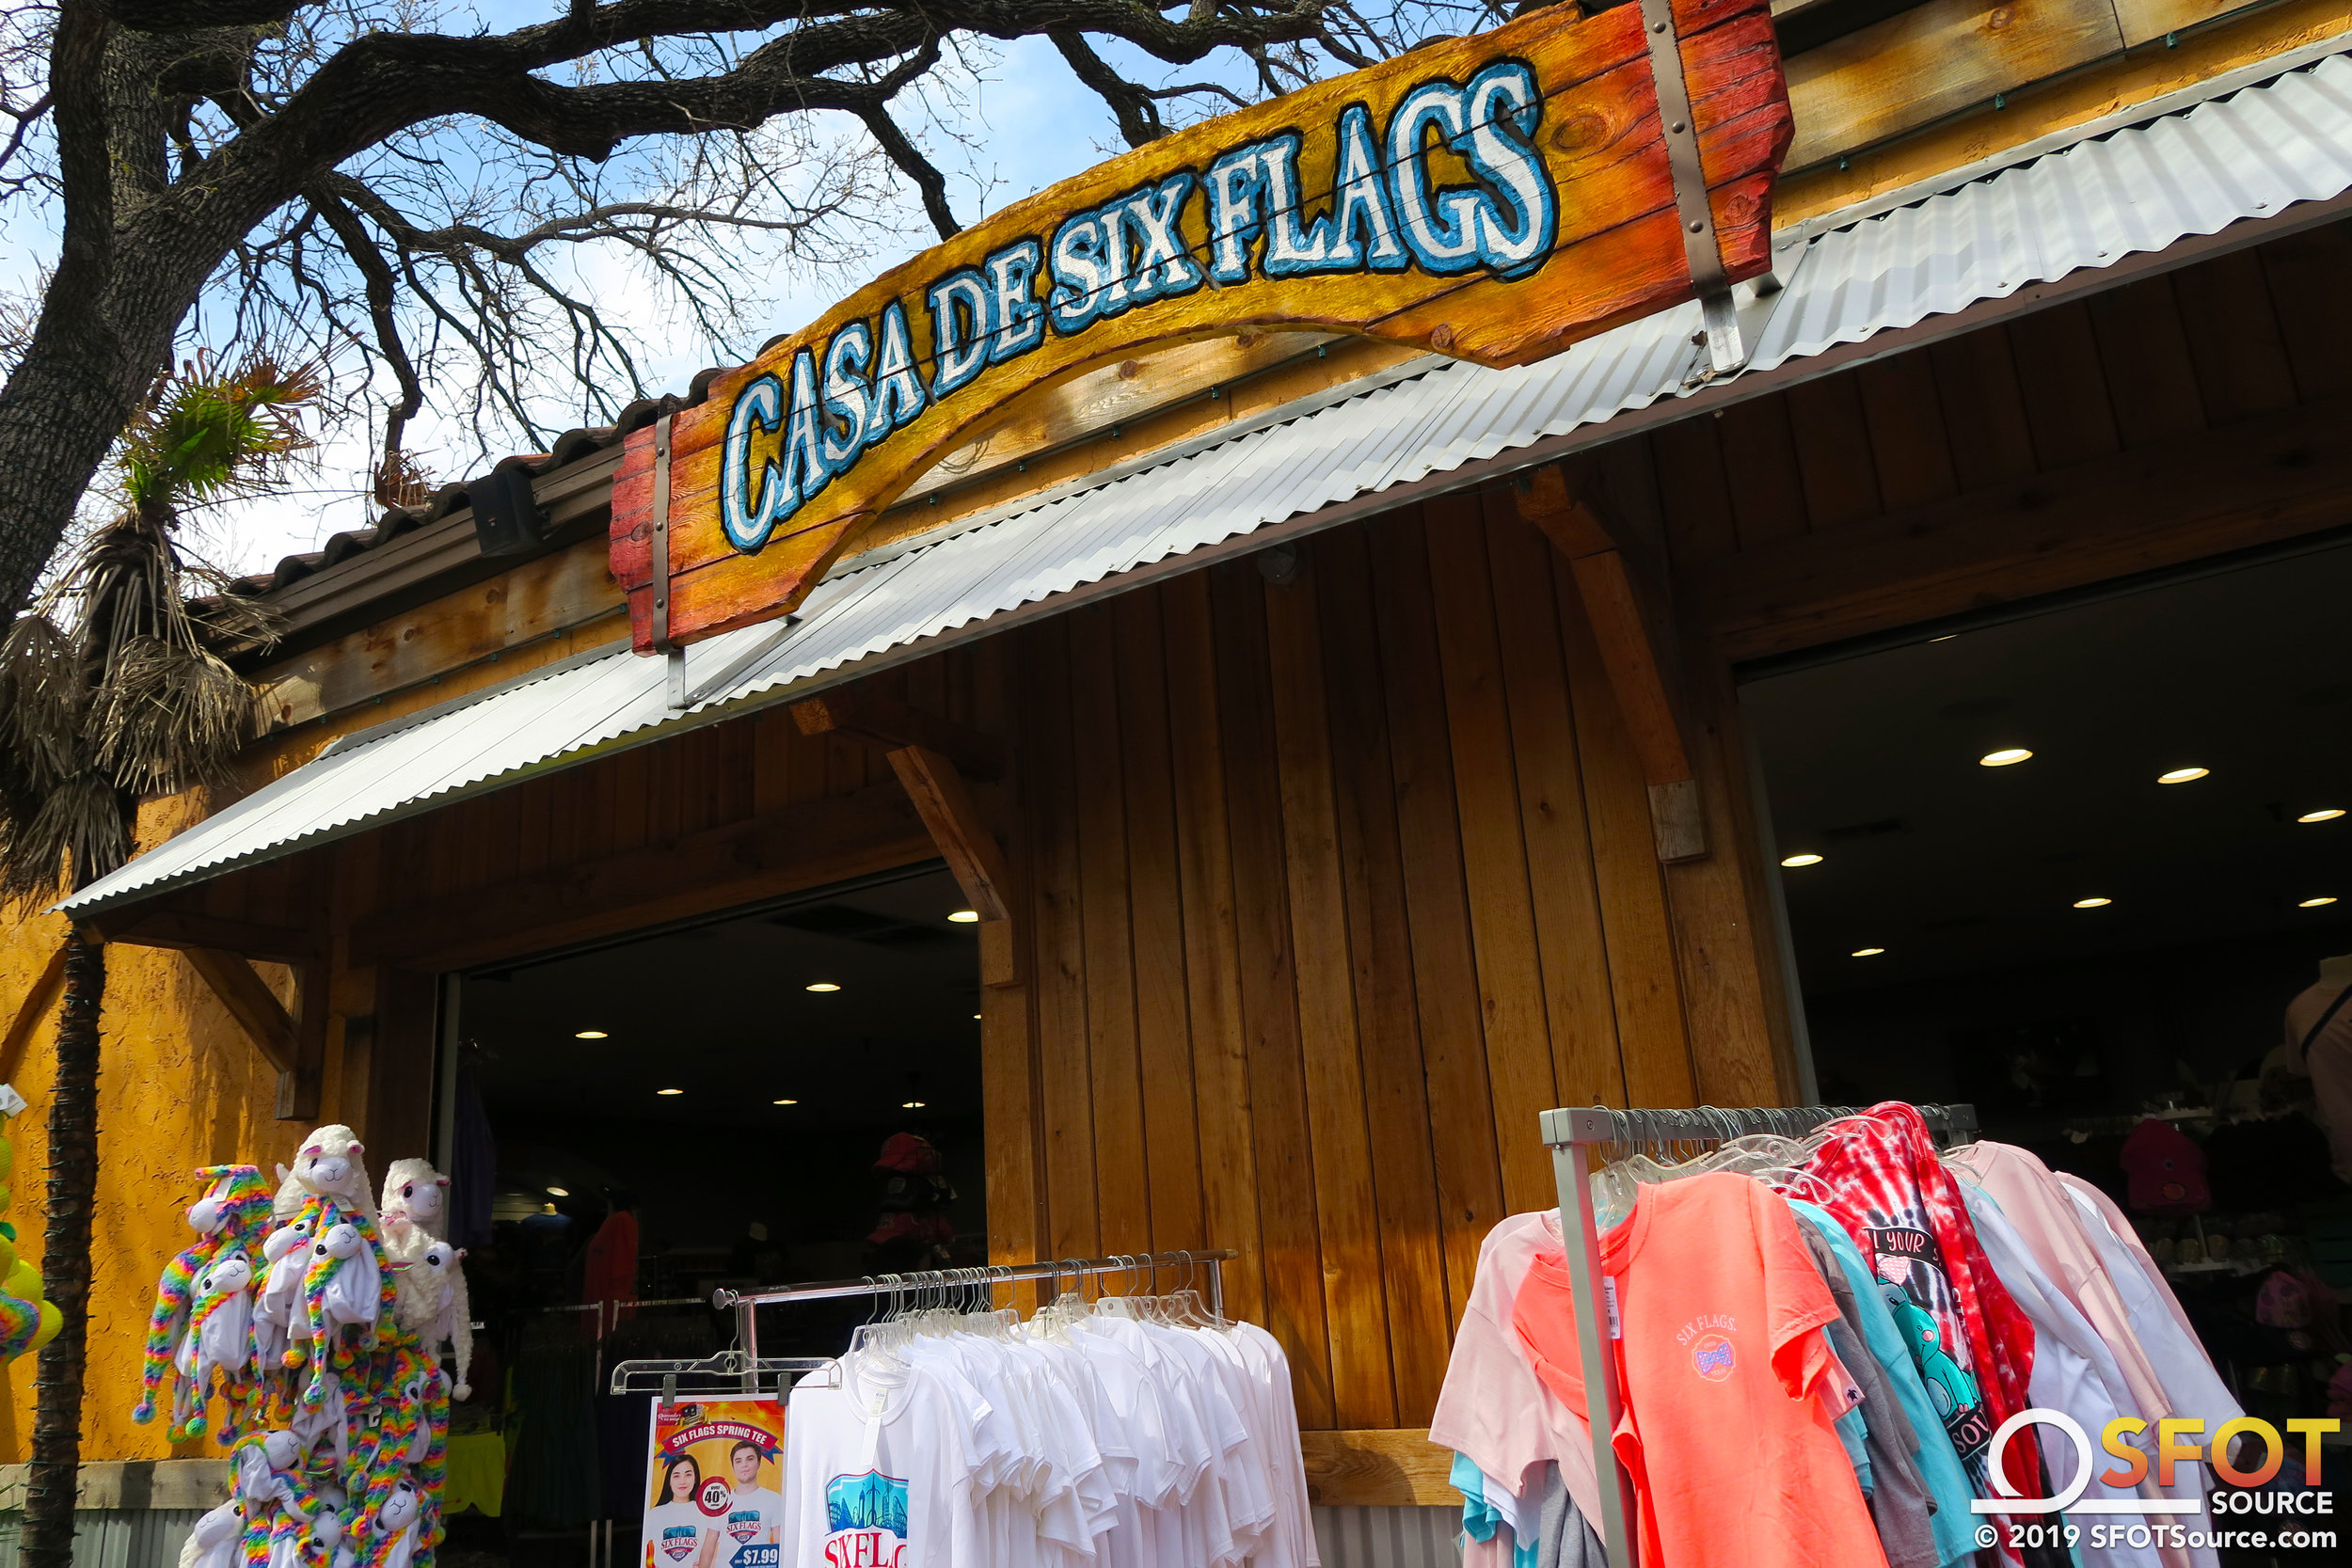 Casa de Six Flags features a wide selection of apparel and souvenirs.